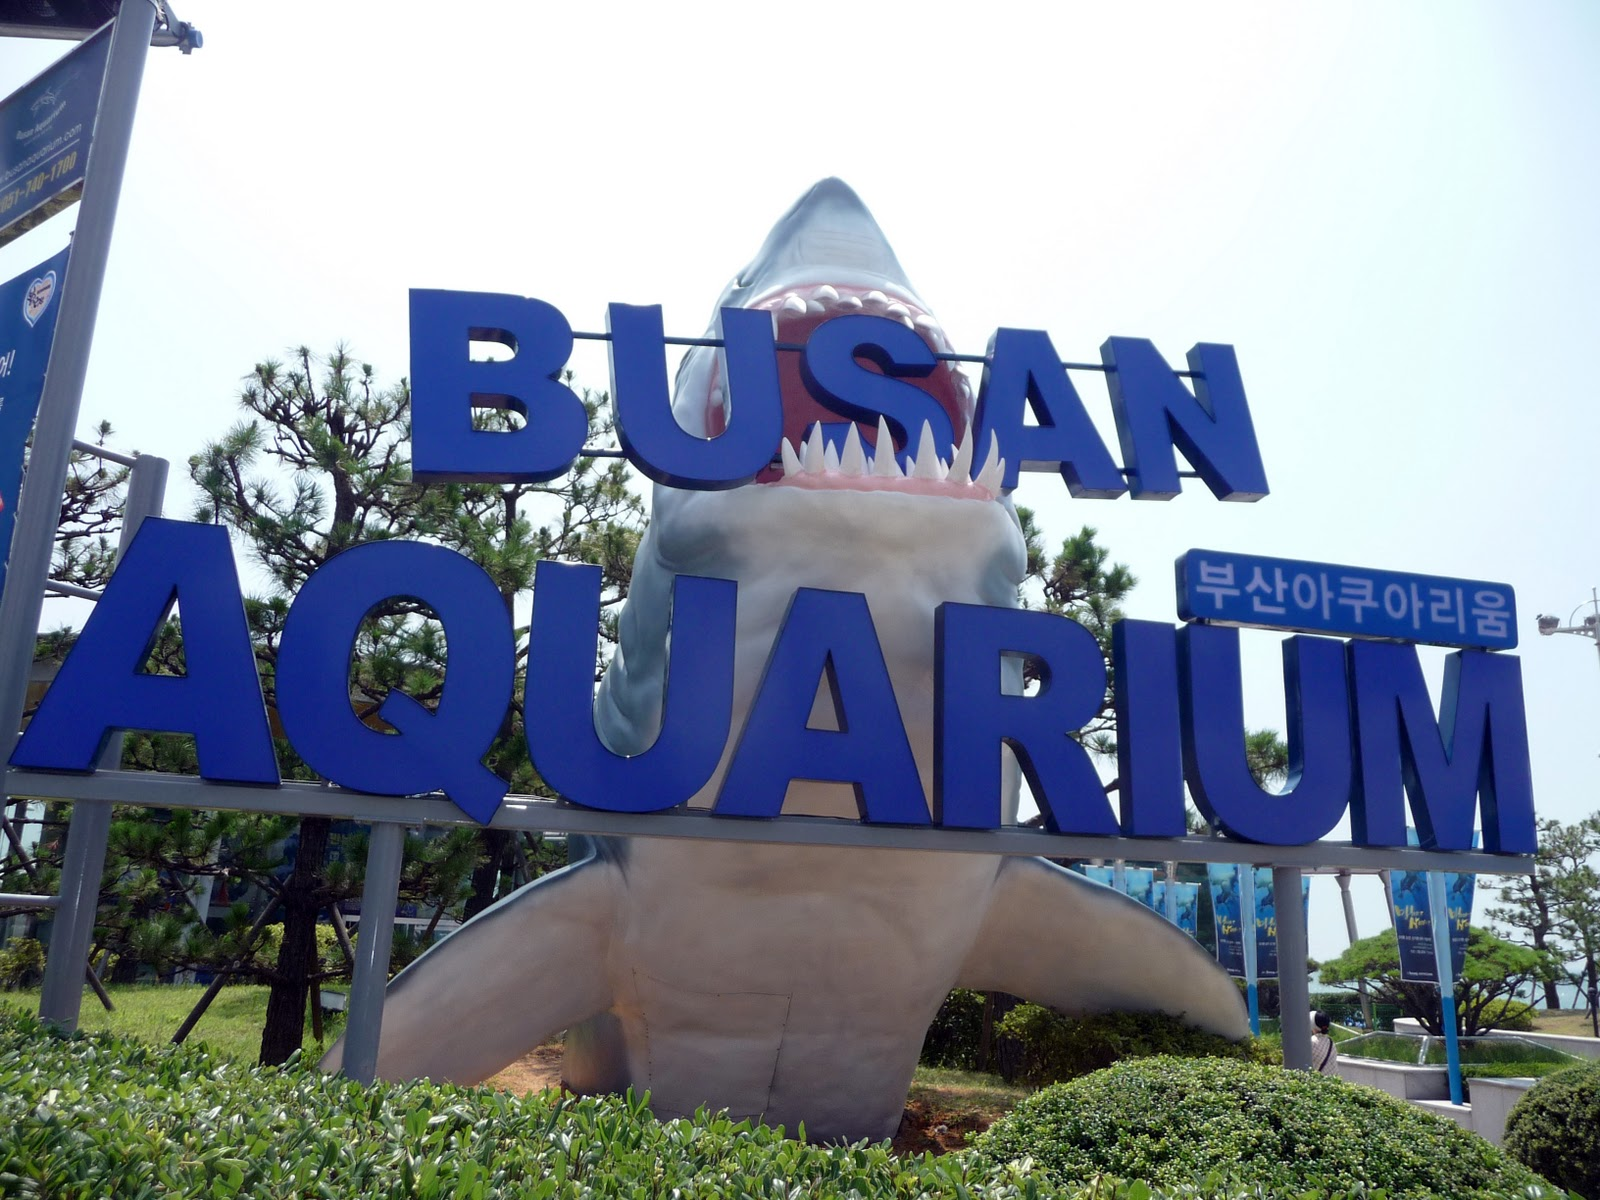 Busan Aquarium Most Popular Attractions South Korea Tourism